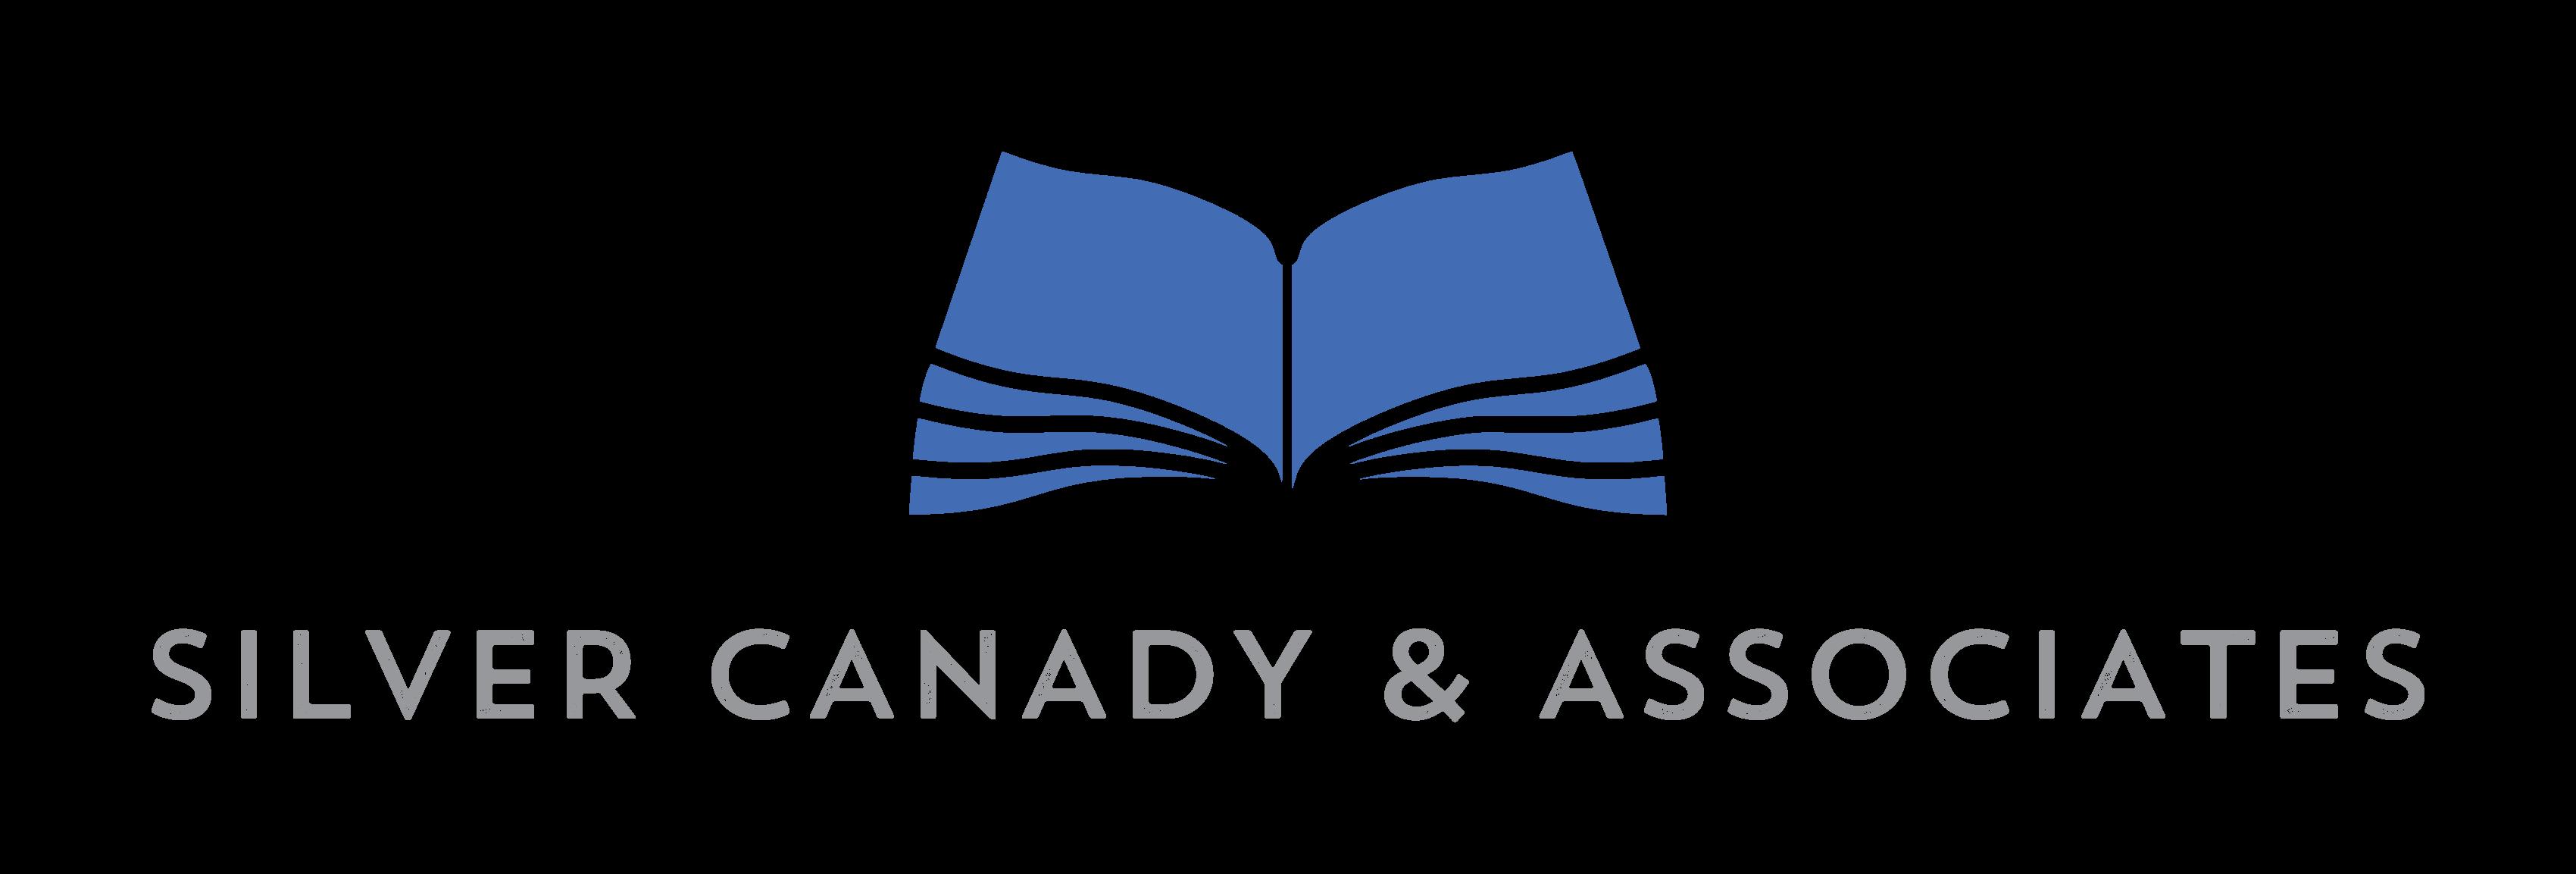 Silver Canady & Associates